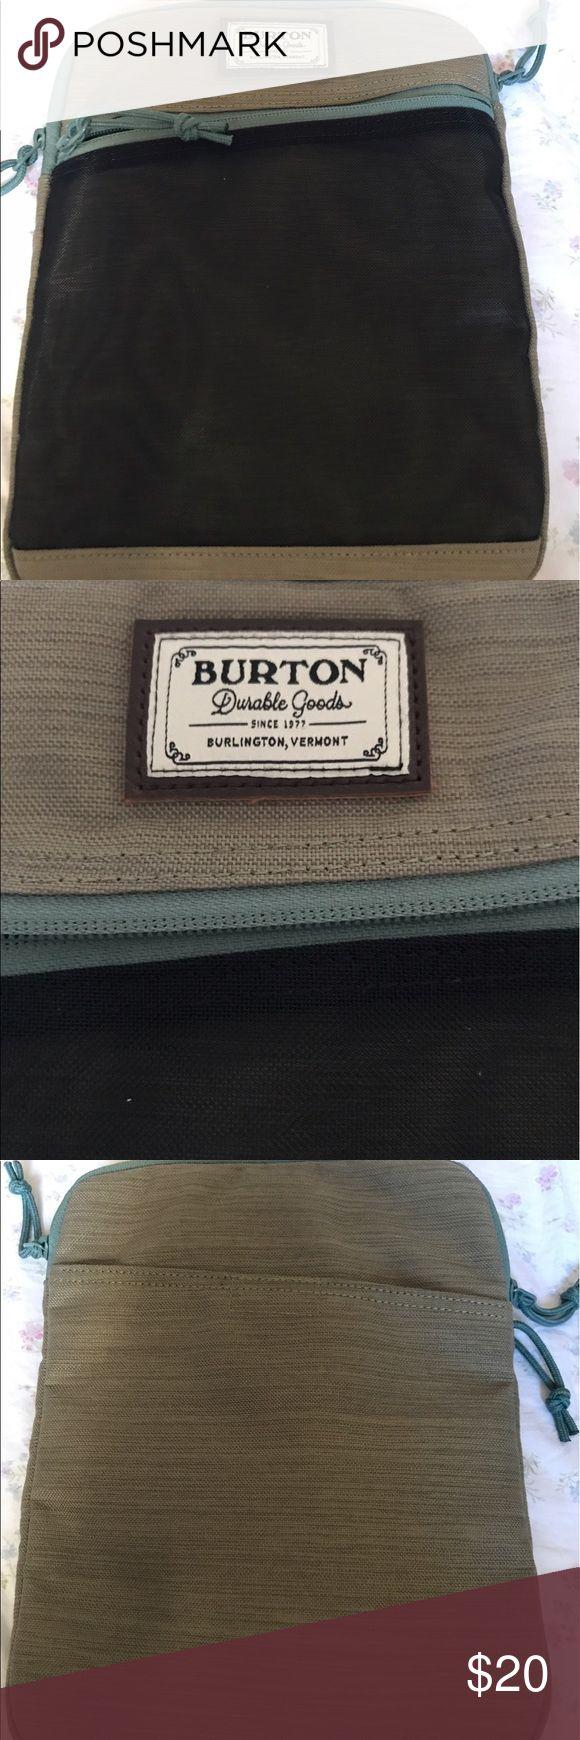 Burton durable goods iPad mini / pro sleeve Brand-new Burton durable goods iPad sleeve case. Still has tags. Never used. Zippers work fine. 2 zippers. Burton Accessories Laptop Cases